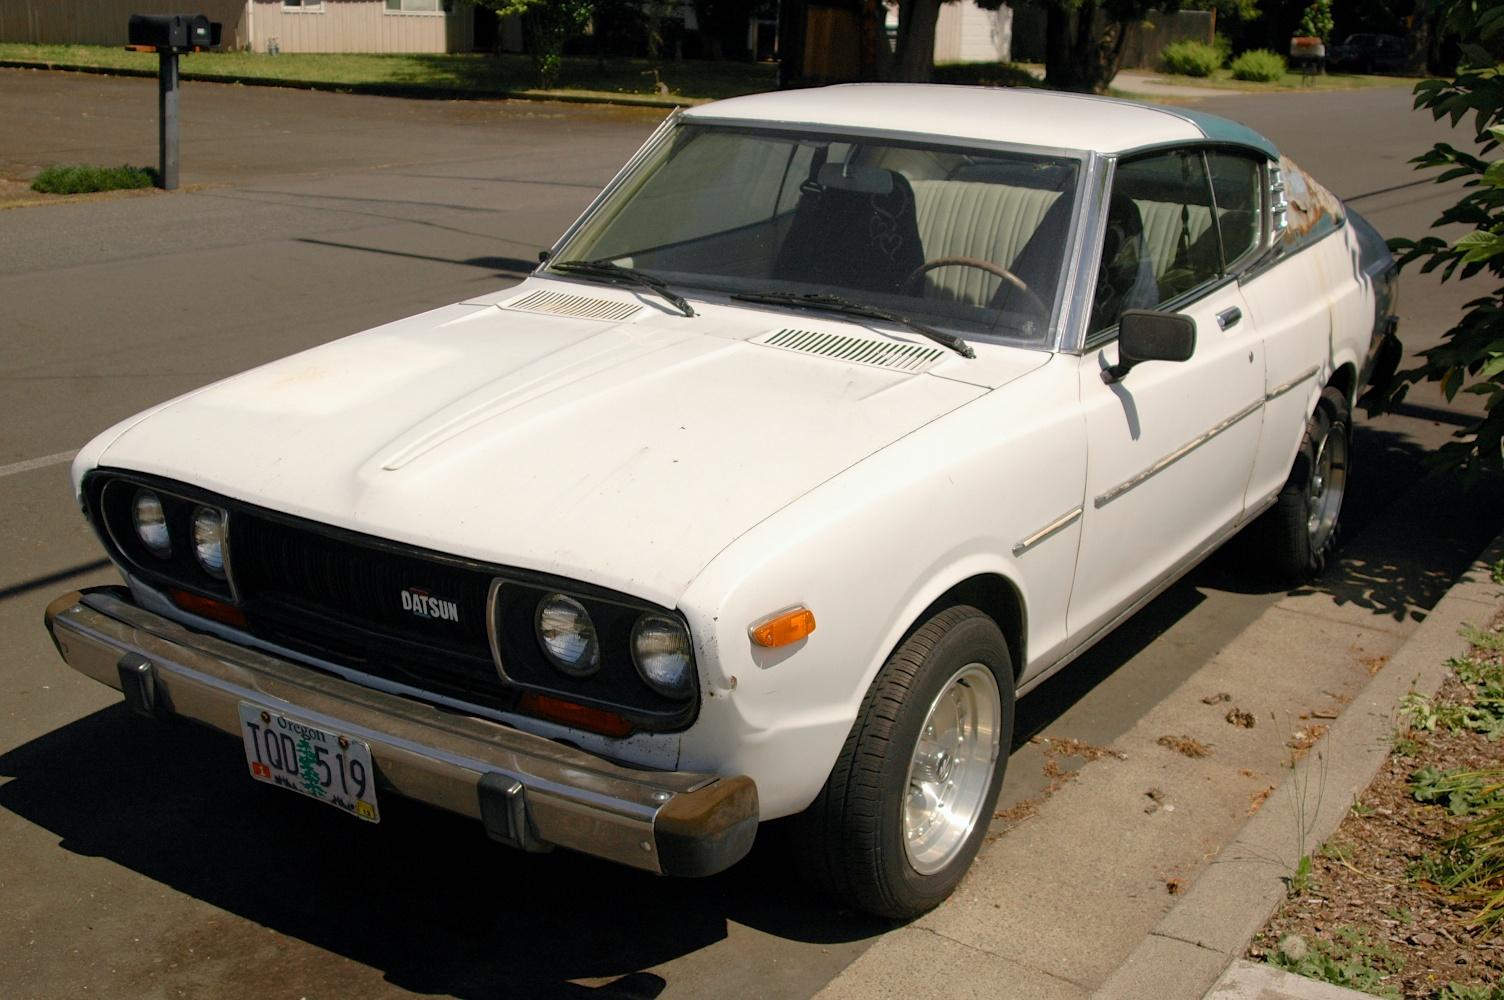 1975 Datsun 710 Hardtop Coupe.